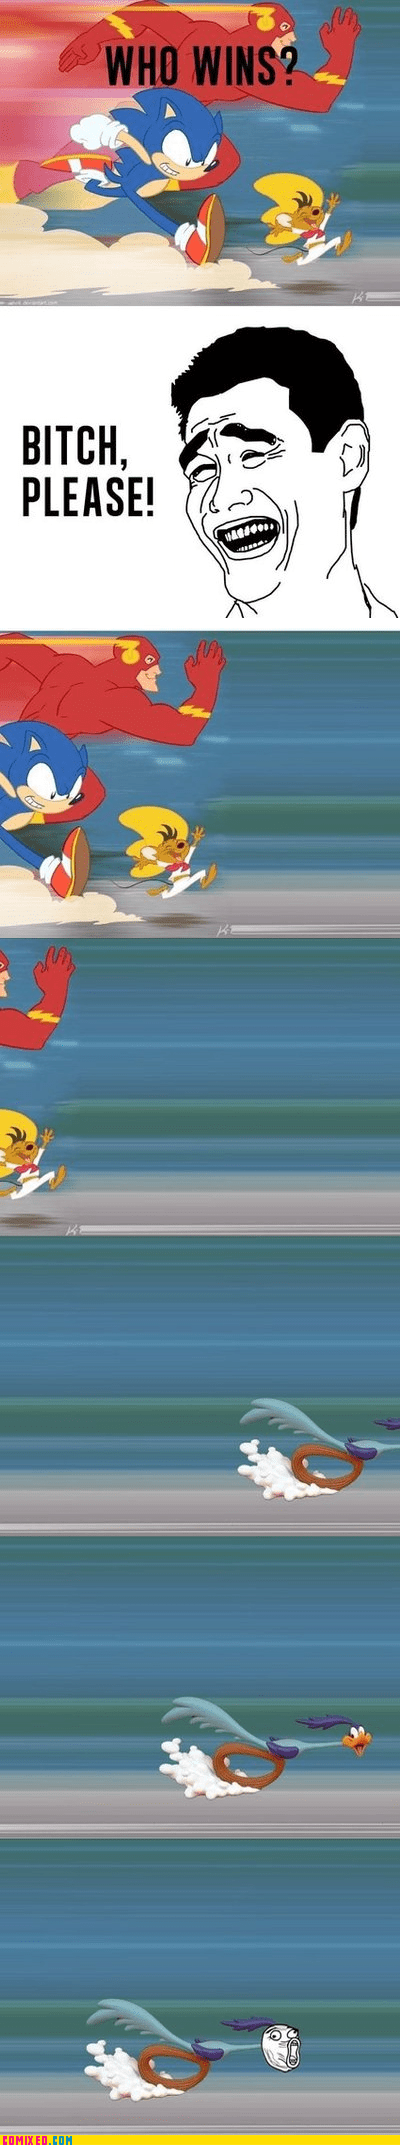 cartoons flash roadrunner sonic speedy gonzales